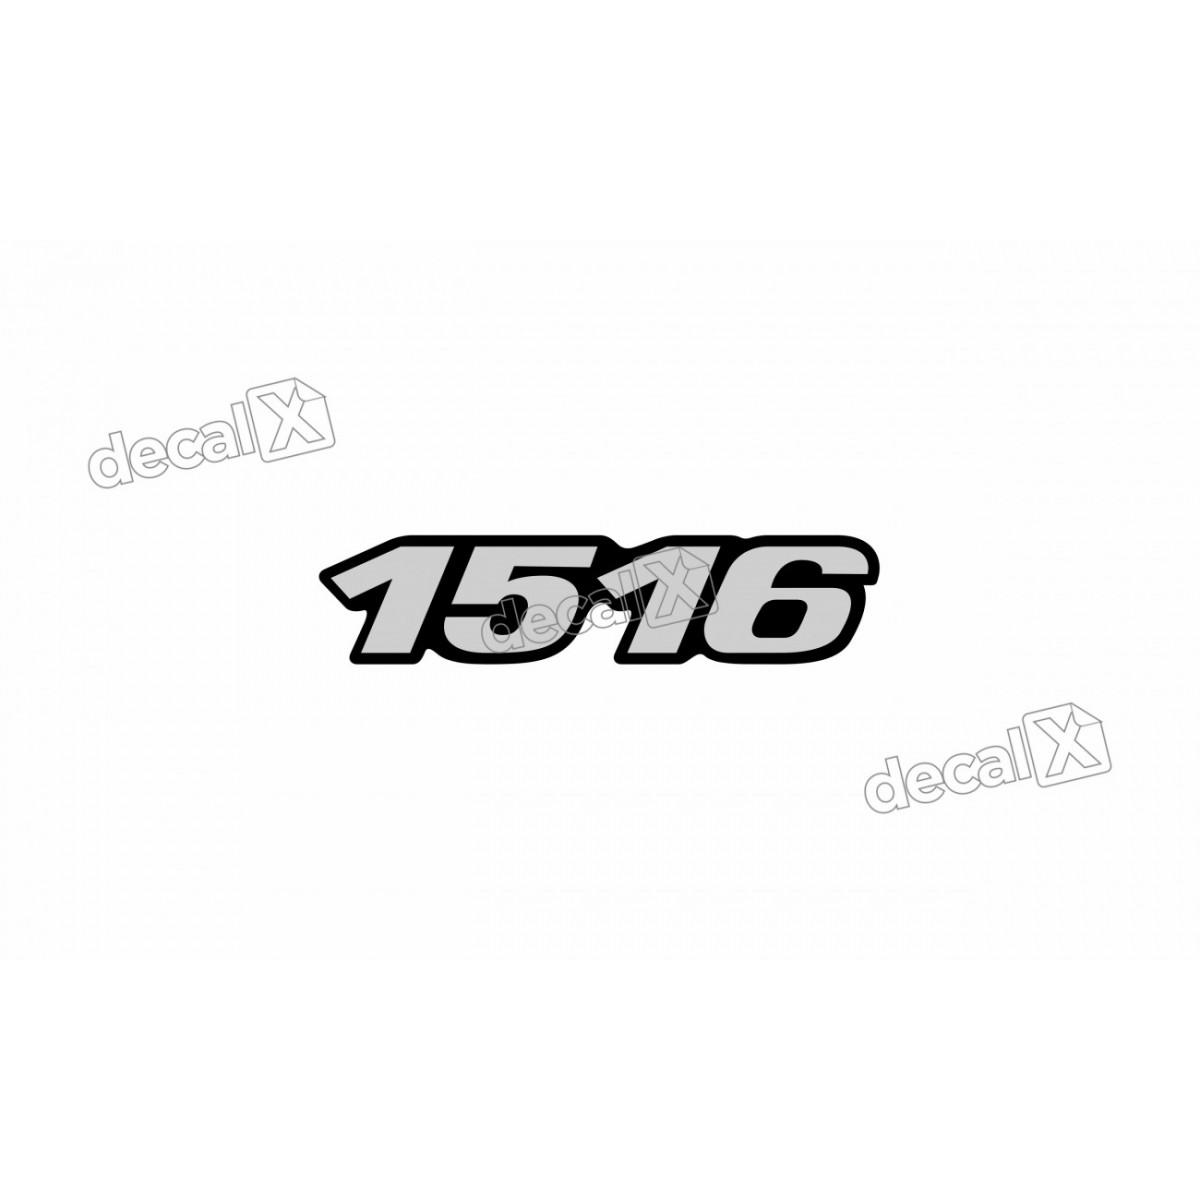 Adesivo Emblema Resinado Mercedes 1516 Cm35 Decalx